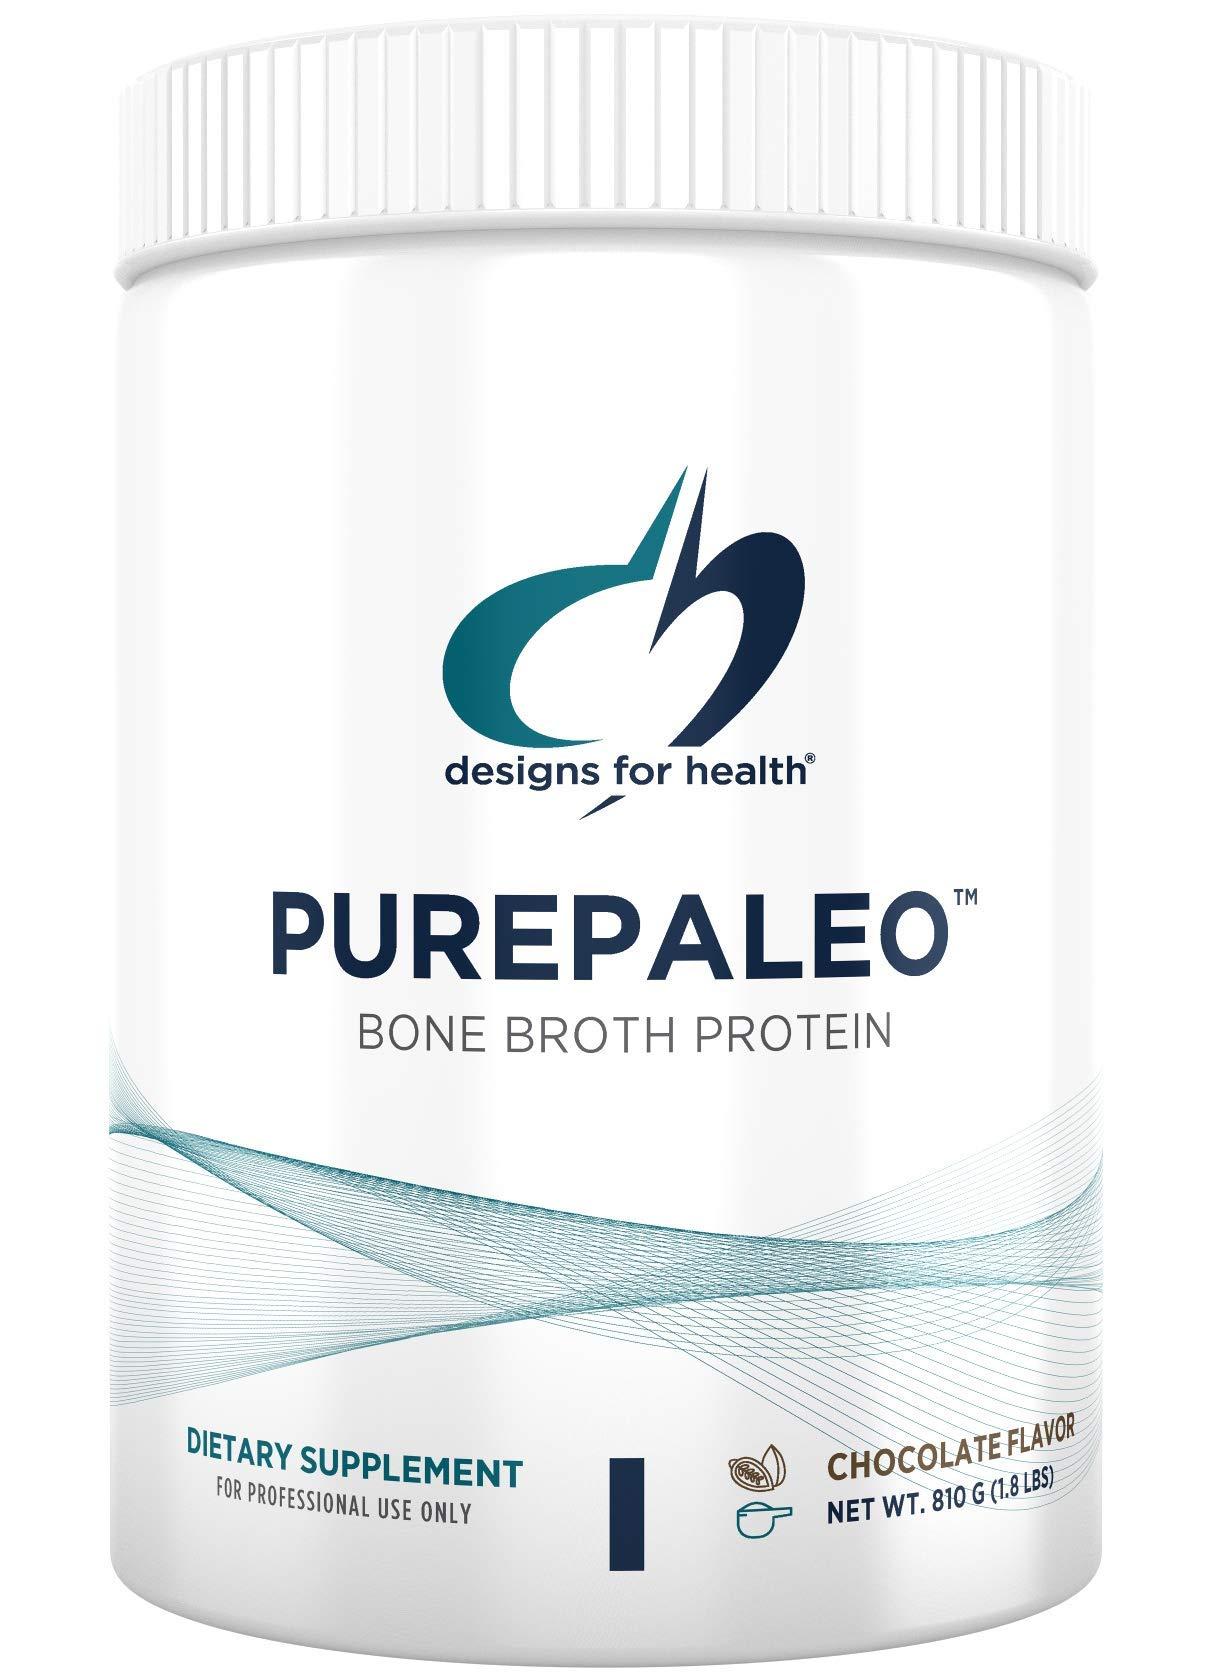 Designs for Health PurePaleo Collagen Protein Powder - Paleo Protein Powder - 21g HydroBEEF Protein with Collagen Peptides + BCAAs - Chocolate - Non GMO and Gluten Free (30 Servings / 810g)